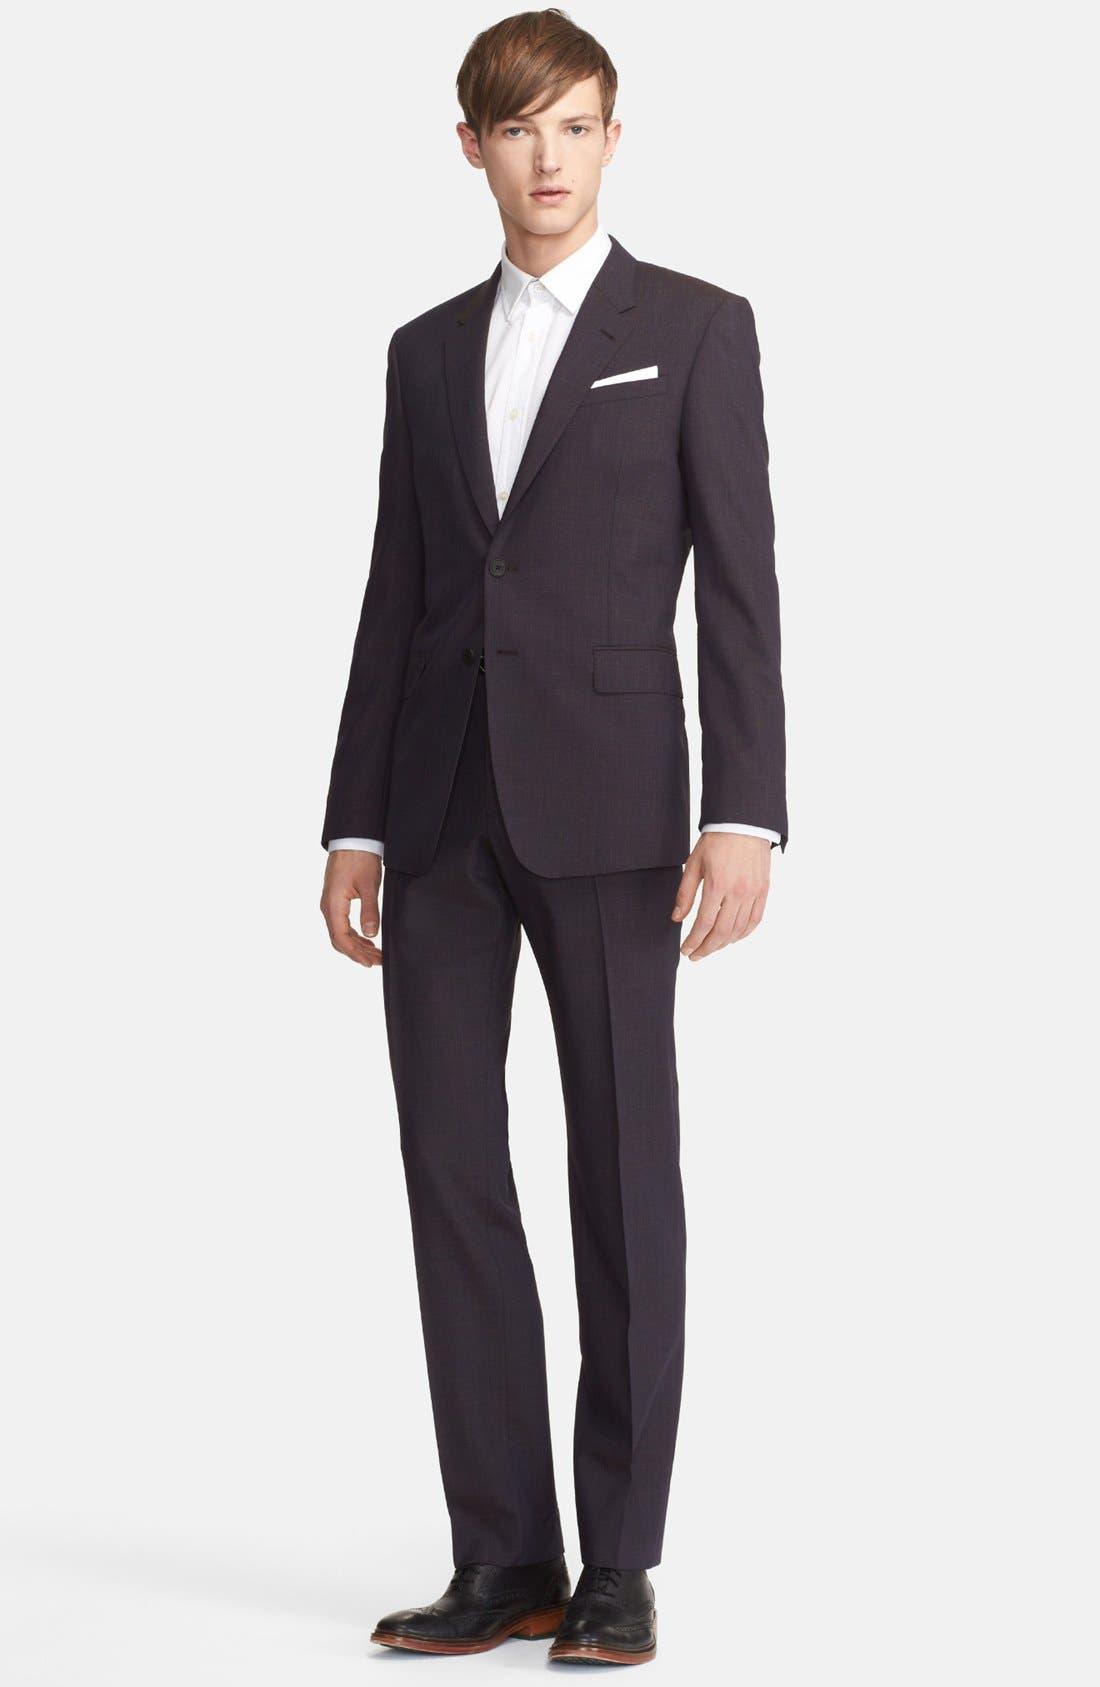 Alternate Image 1 Selected - Paul Smith London 'Byard' Mélange Wool Blend Suit